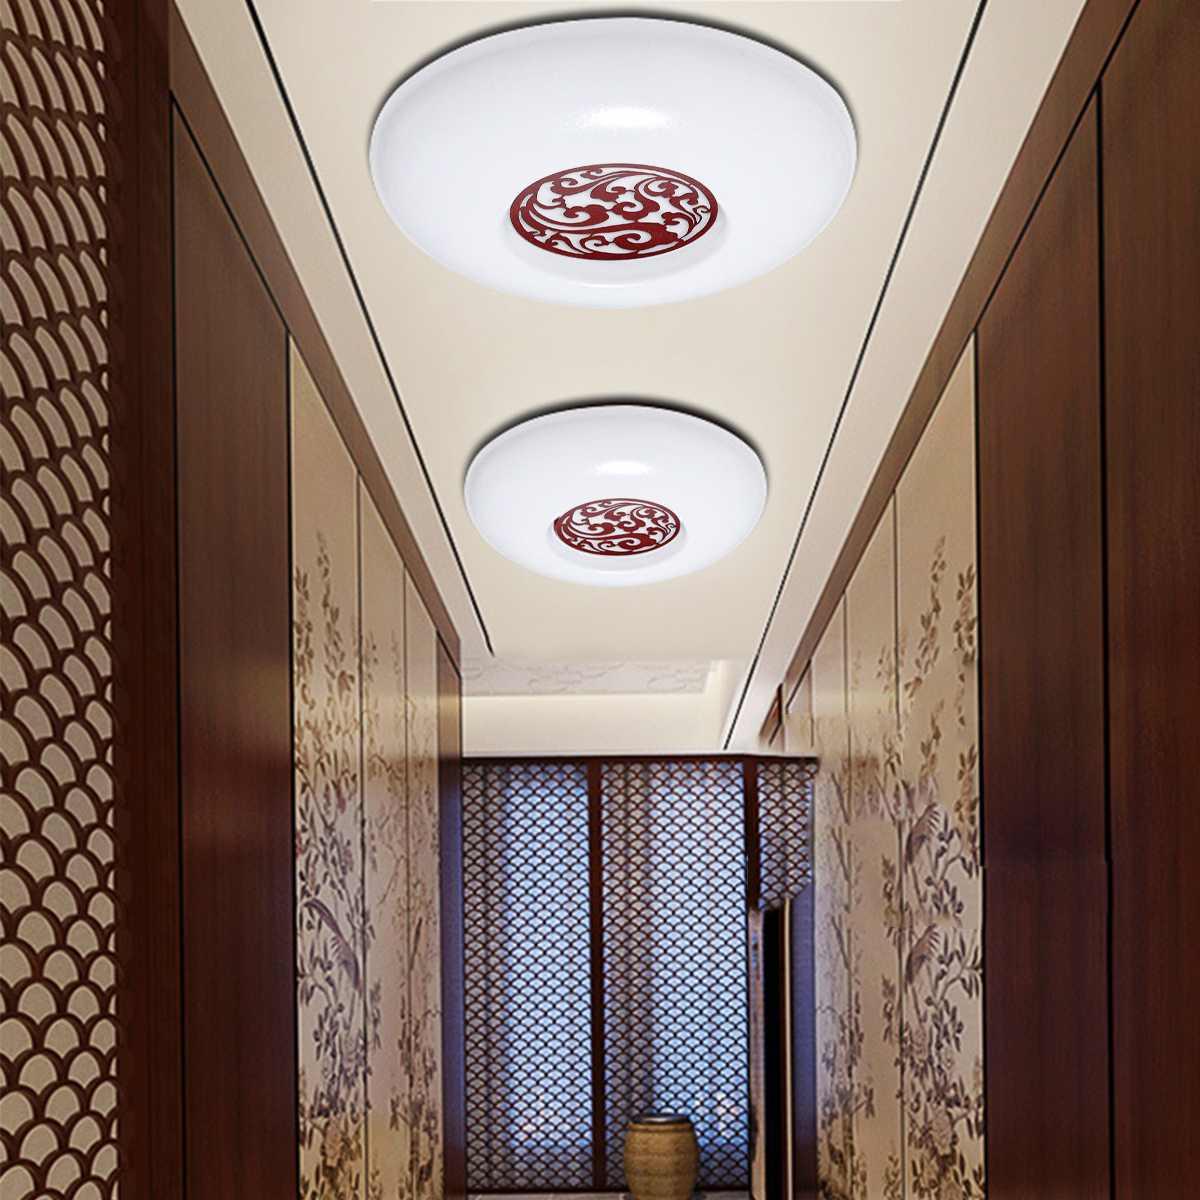 12 W 15 W 18 W Moderne Led Plafondlamp Ronde Surface Mount Plafond Lamp Voor Woonkamer Slaapkamer Gangen Armatuur Verlichting